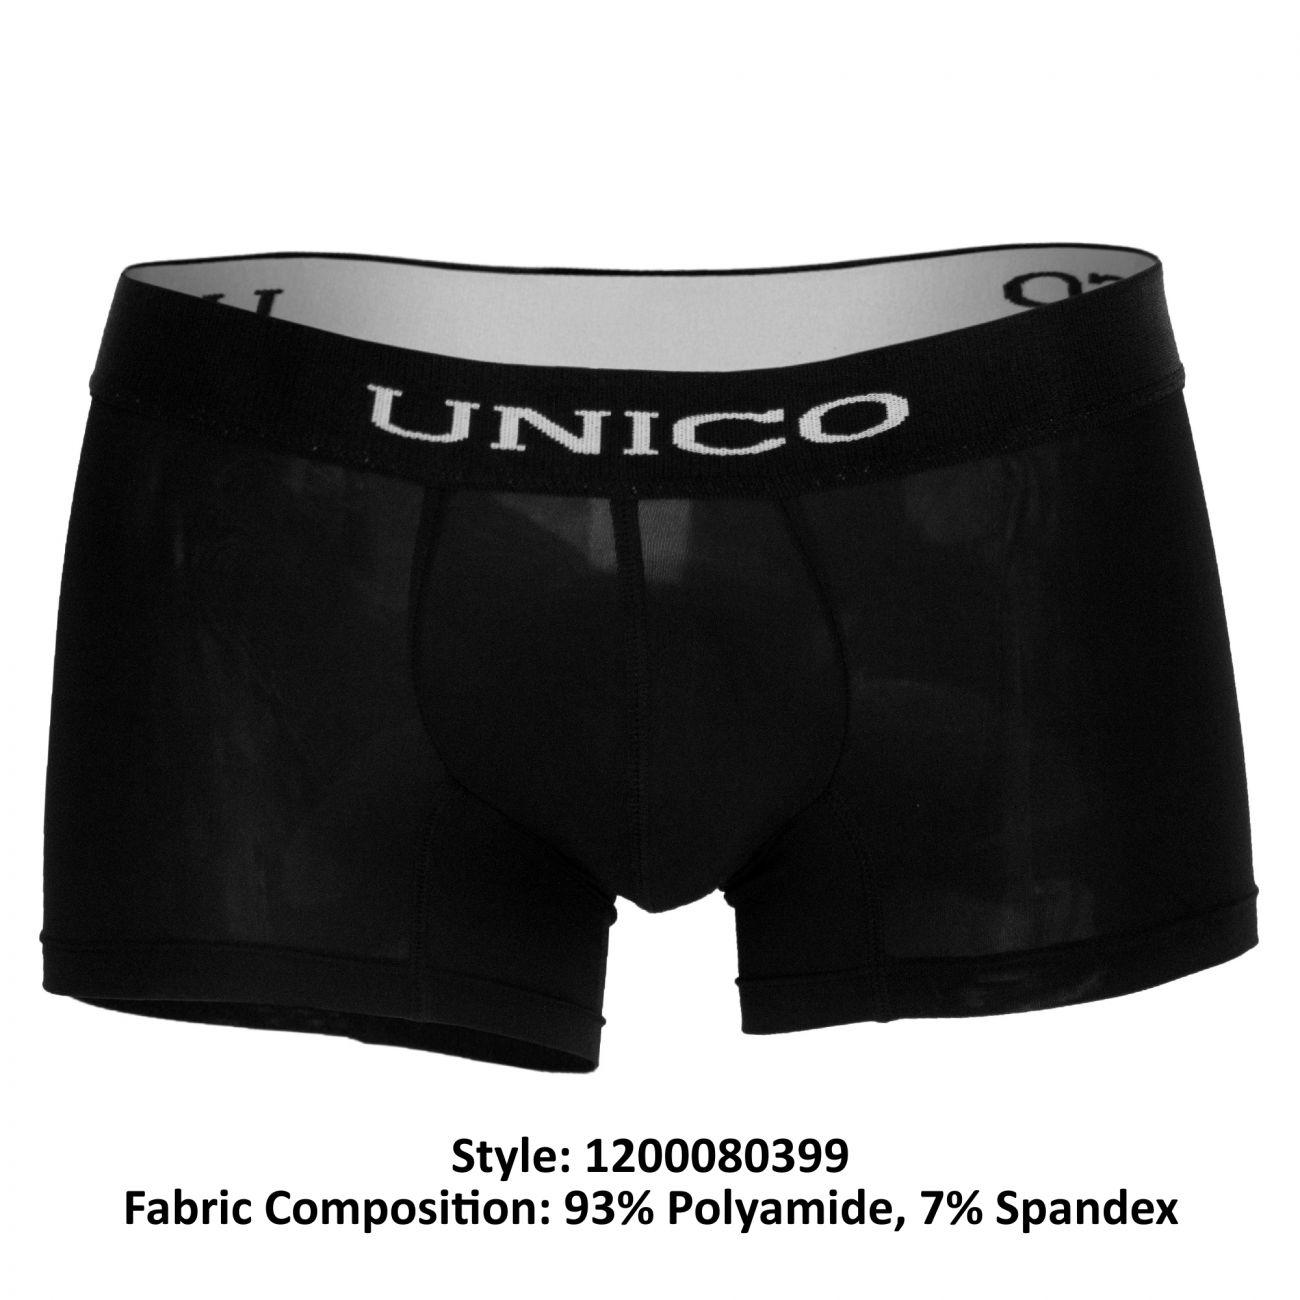 Unico Brief INTENSO Cotton Men/'s Underwear